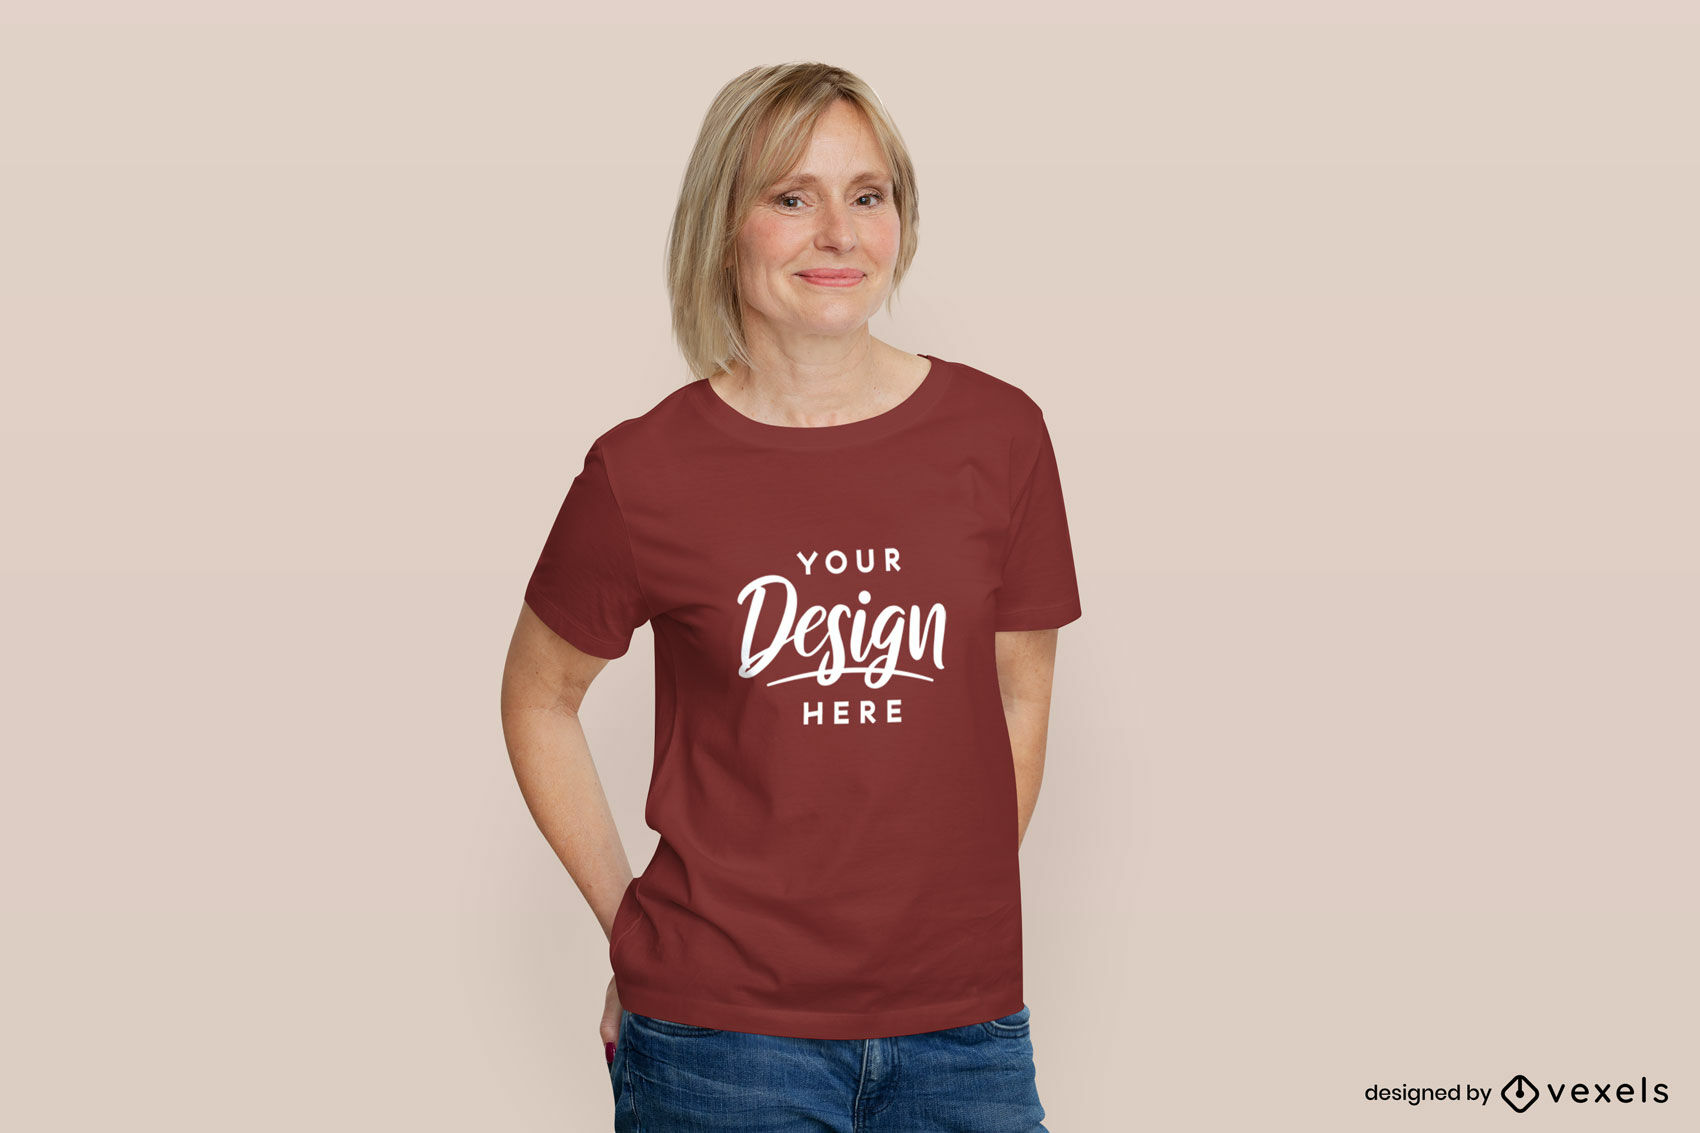 Mujer en camiseta roja maqueta fondo plano